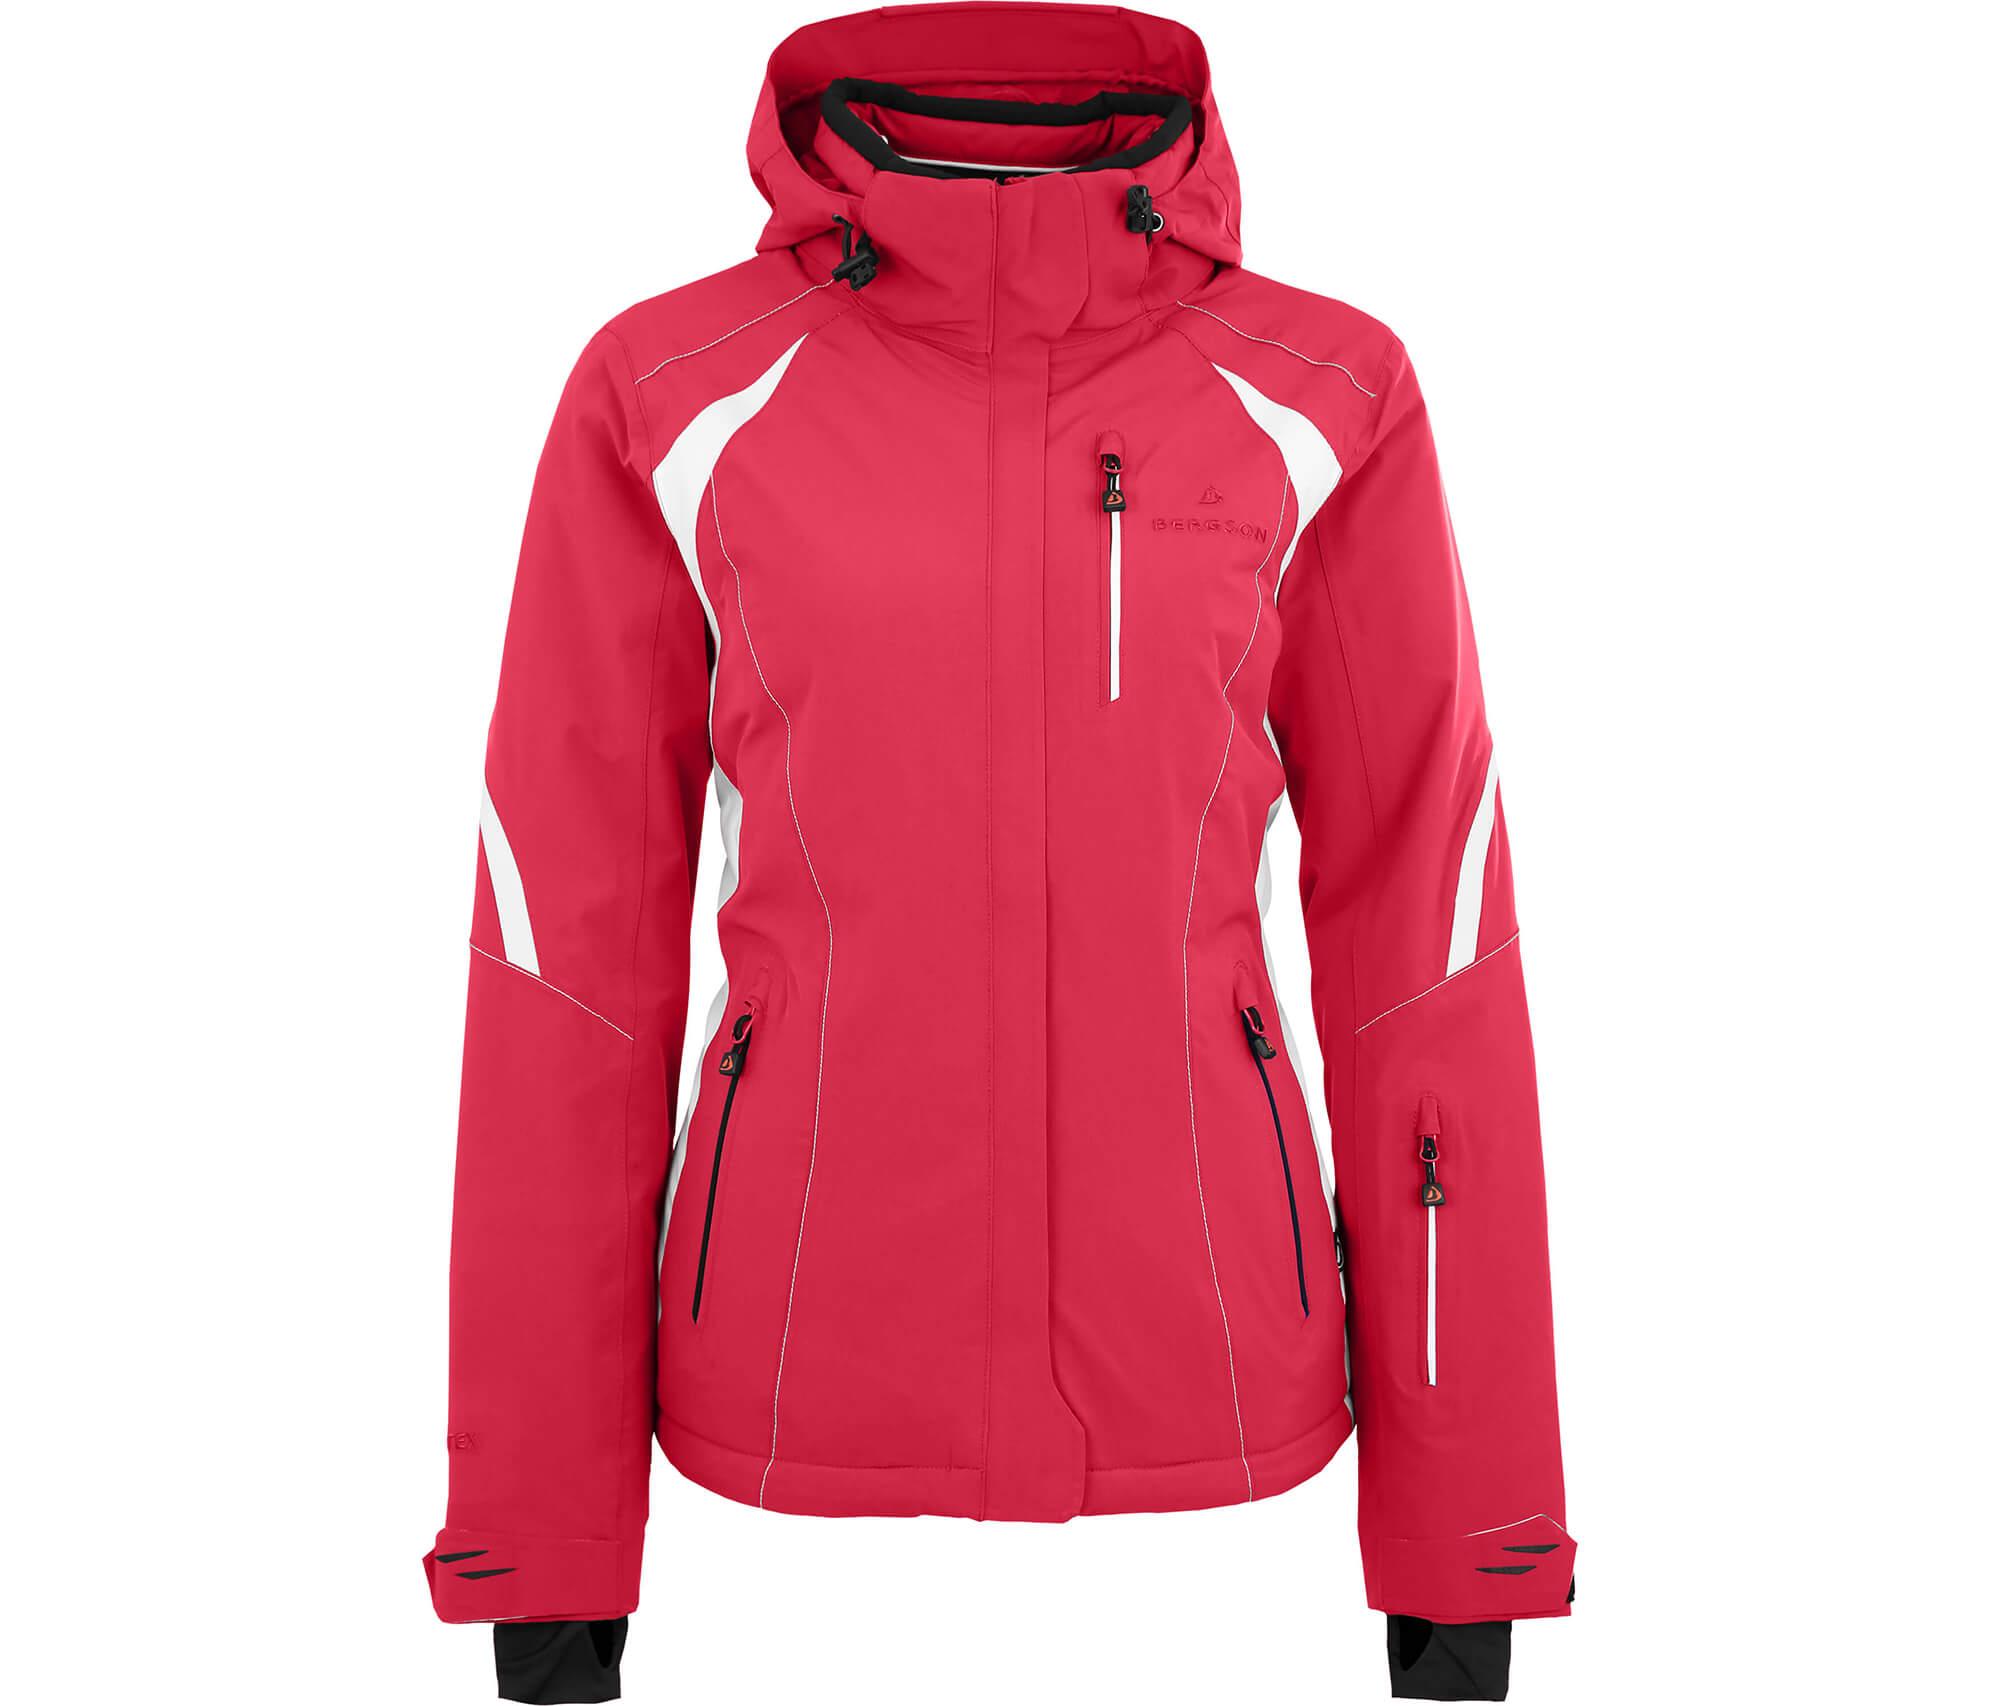 Bergson Damen Skijacke SNOWTASTIC pink